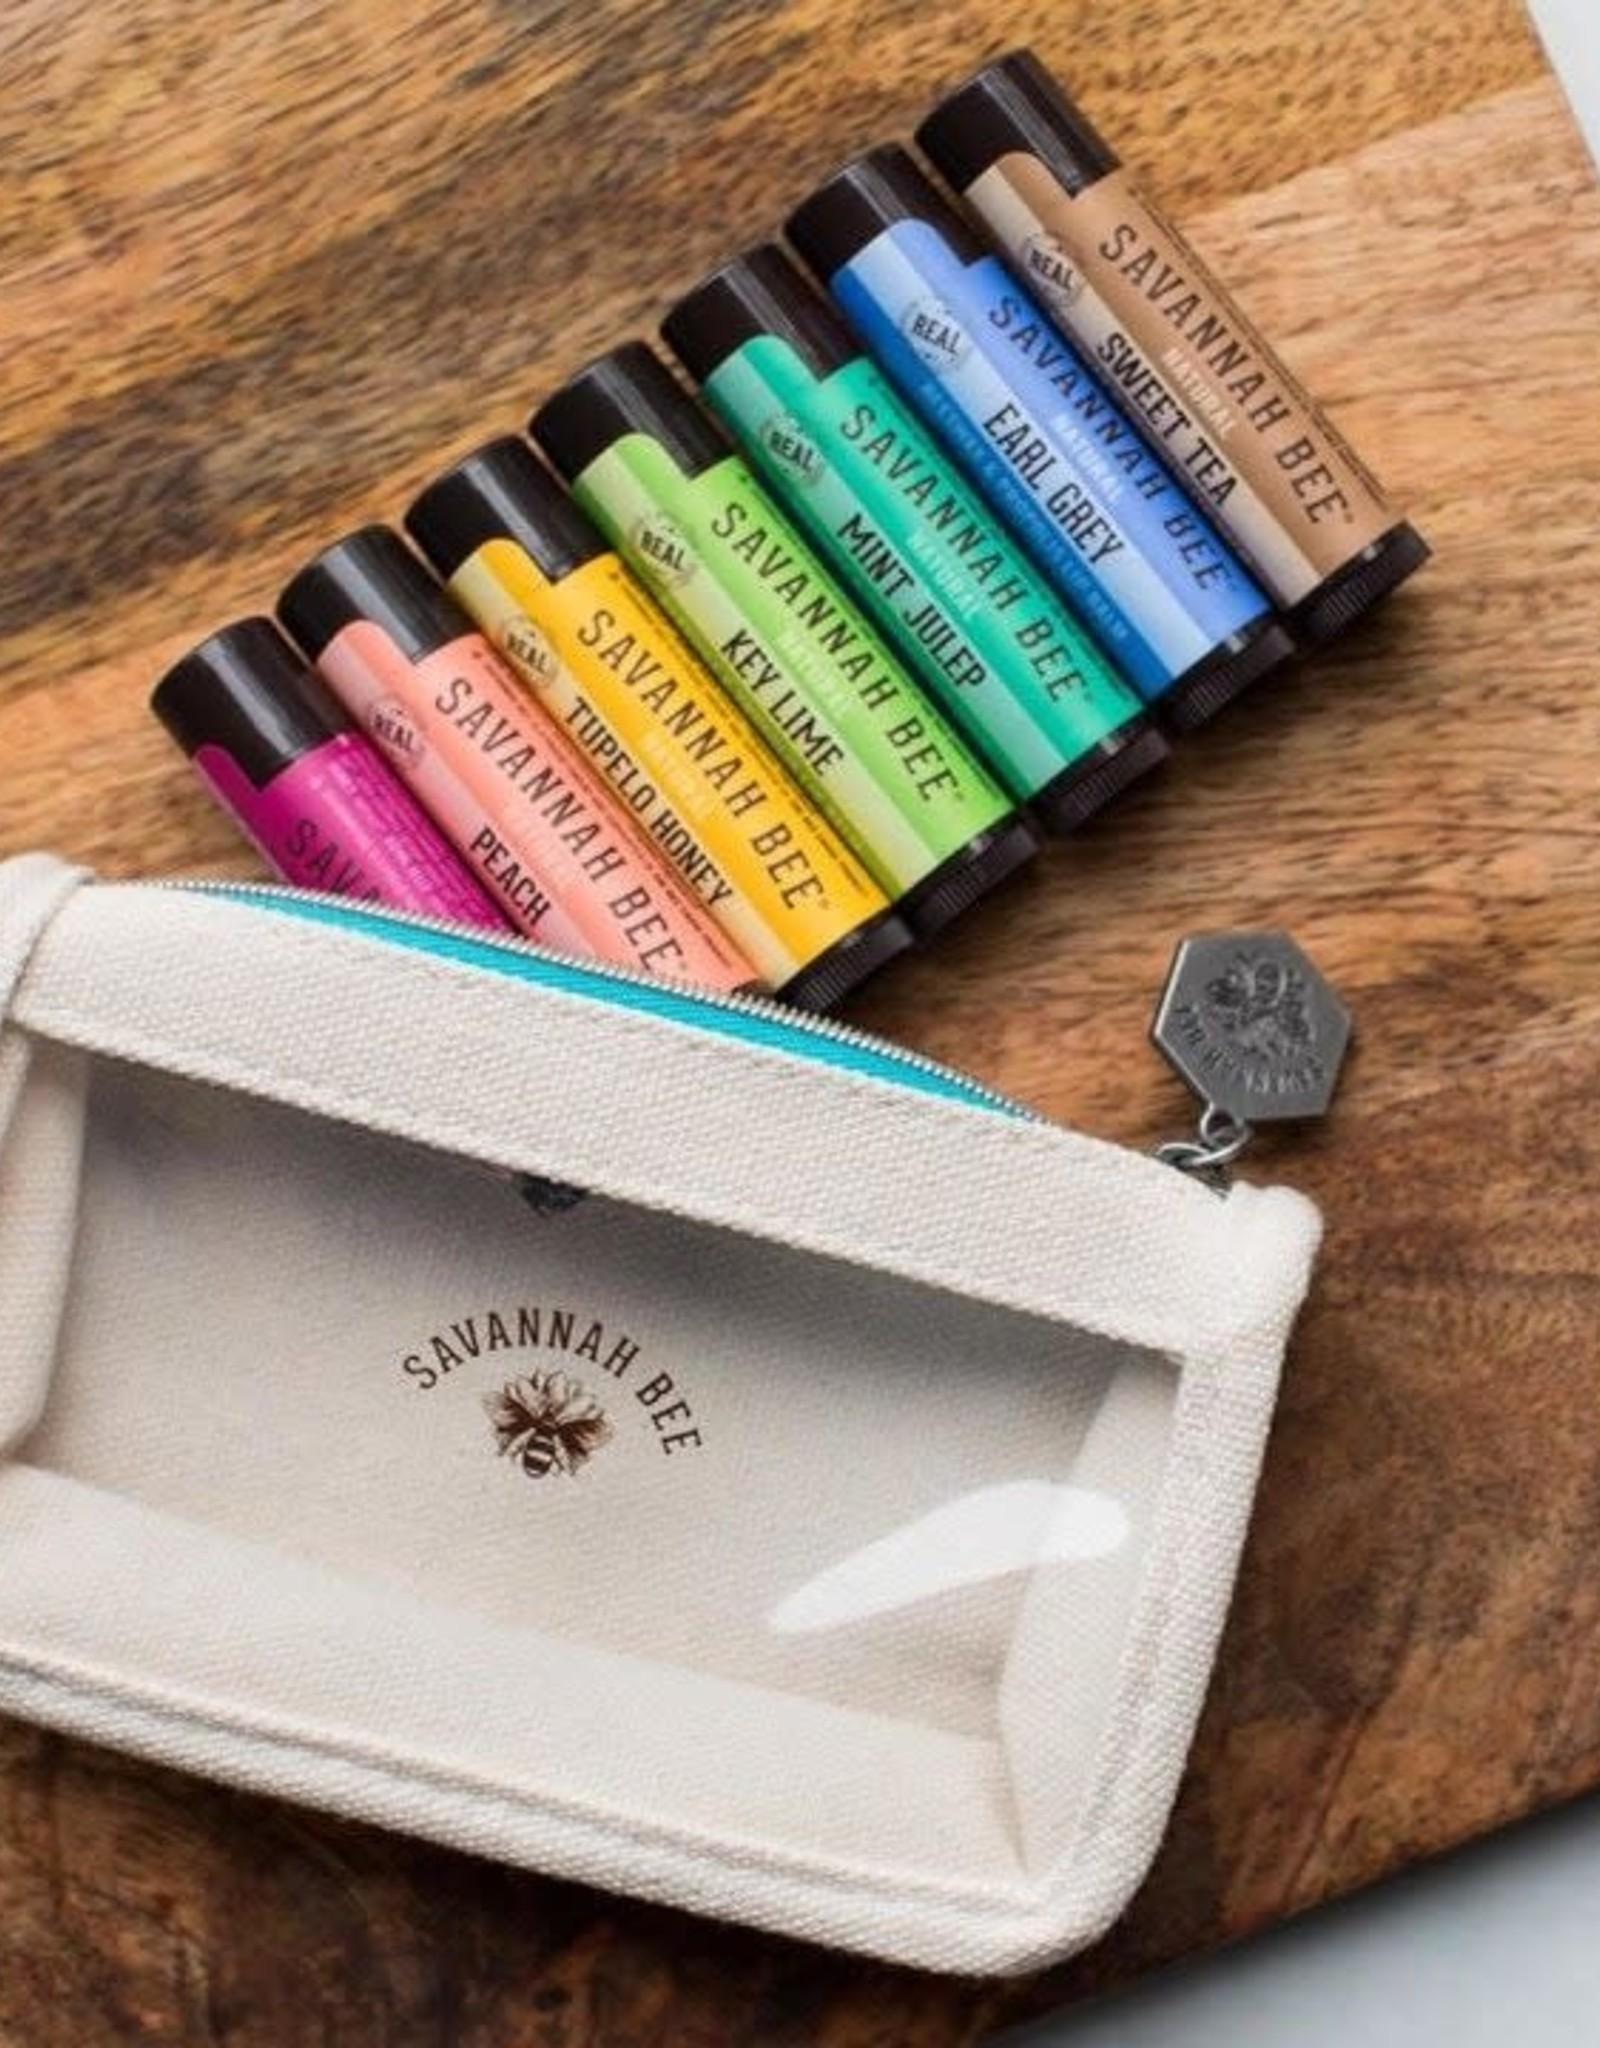 Savannah Bee Company Bee the Balm Gift Set